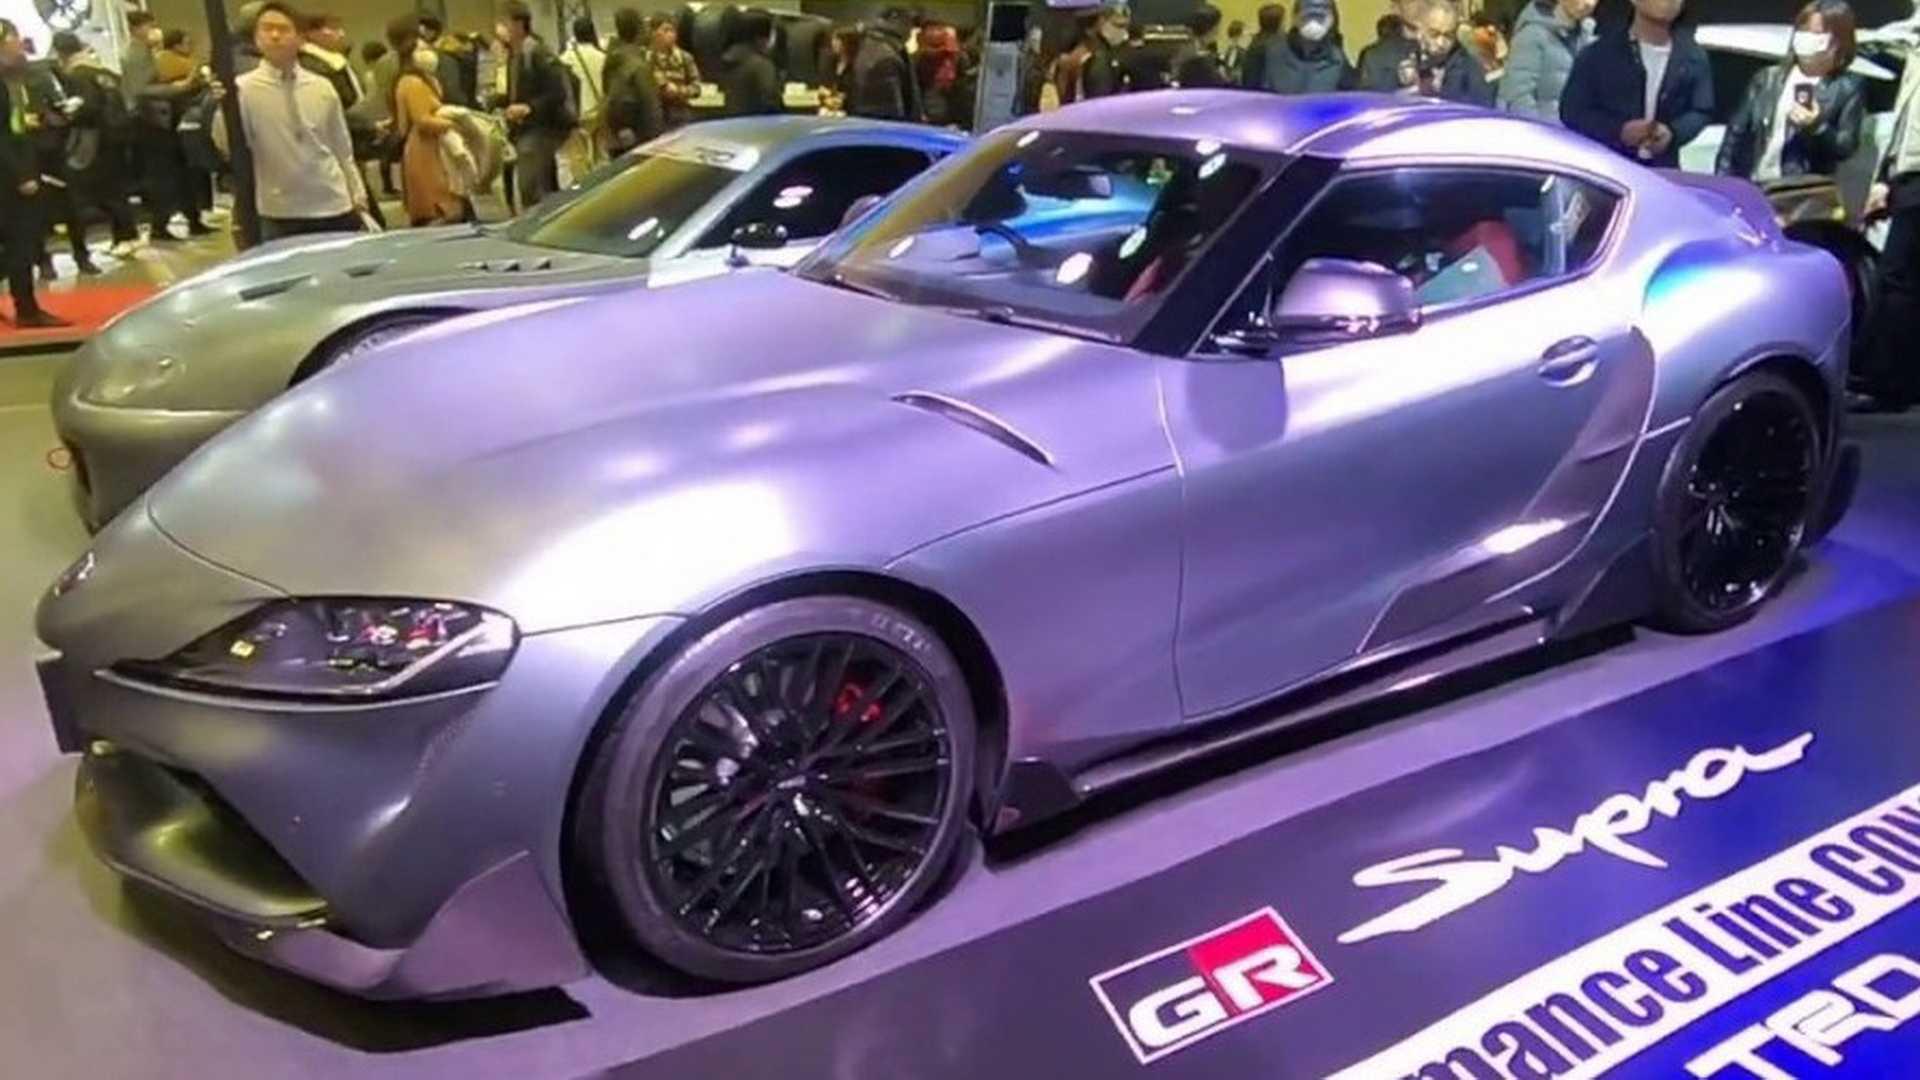 toyota supra trd concept shows its racy body on camera Toyota Supra 3000GT